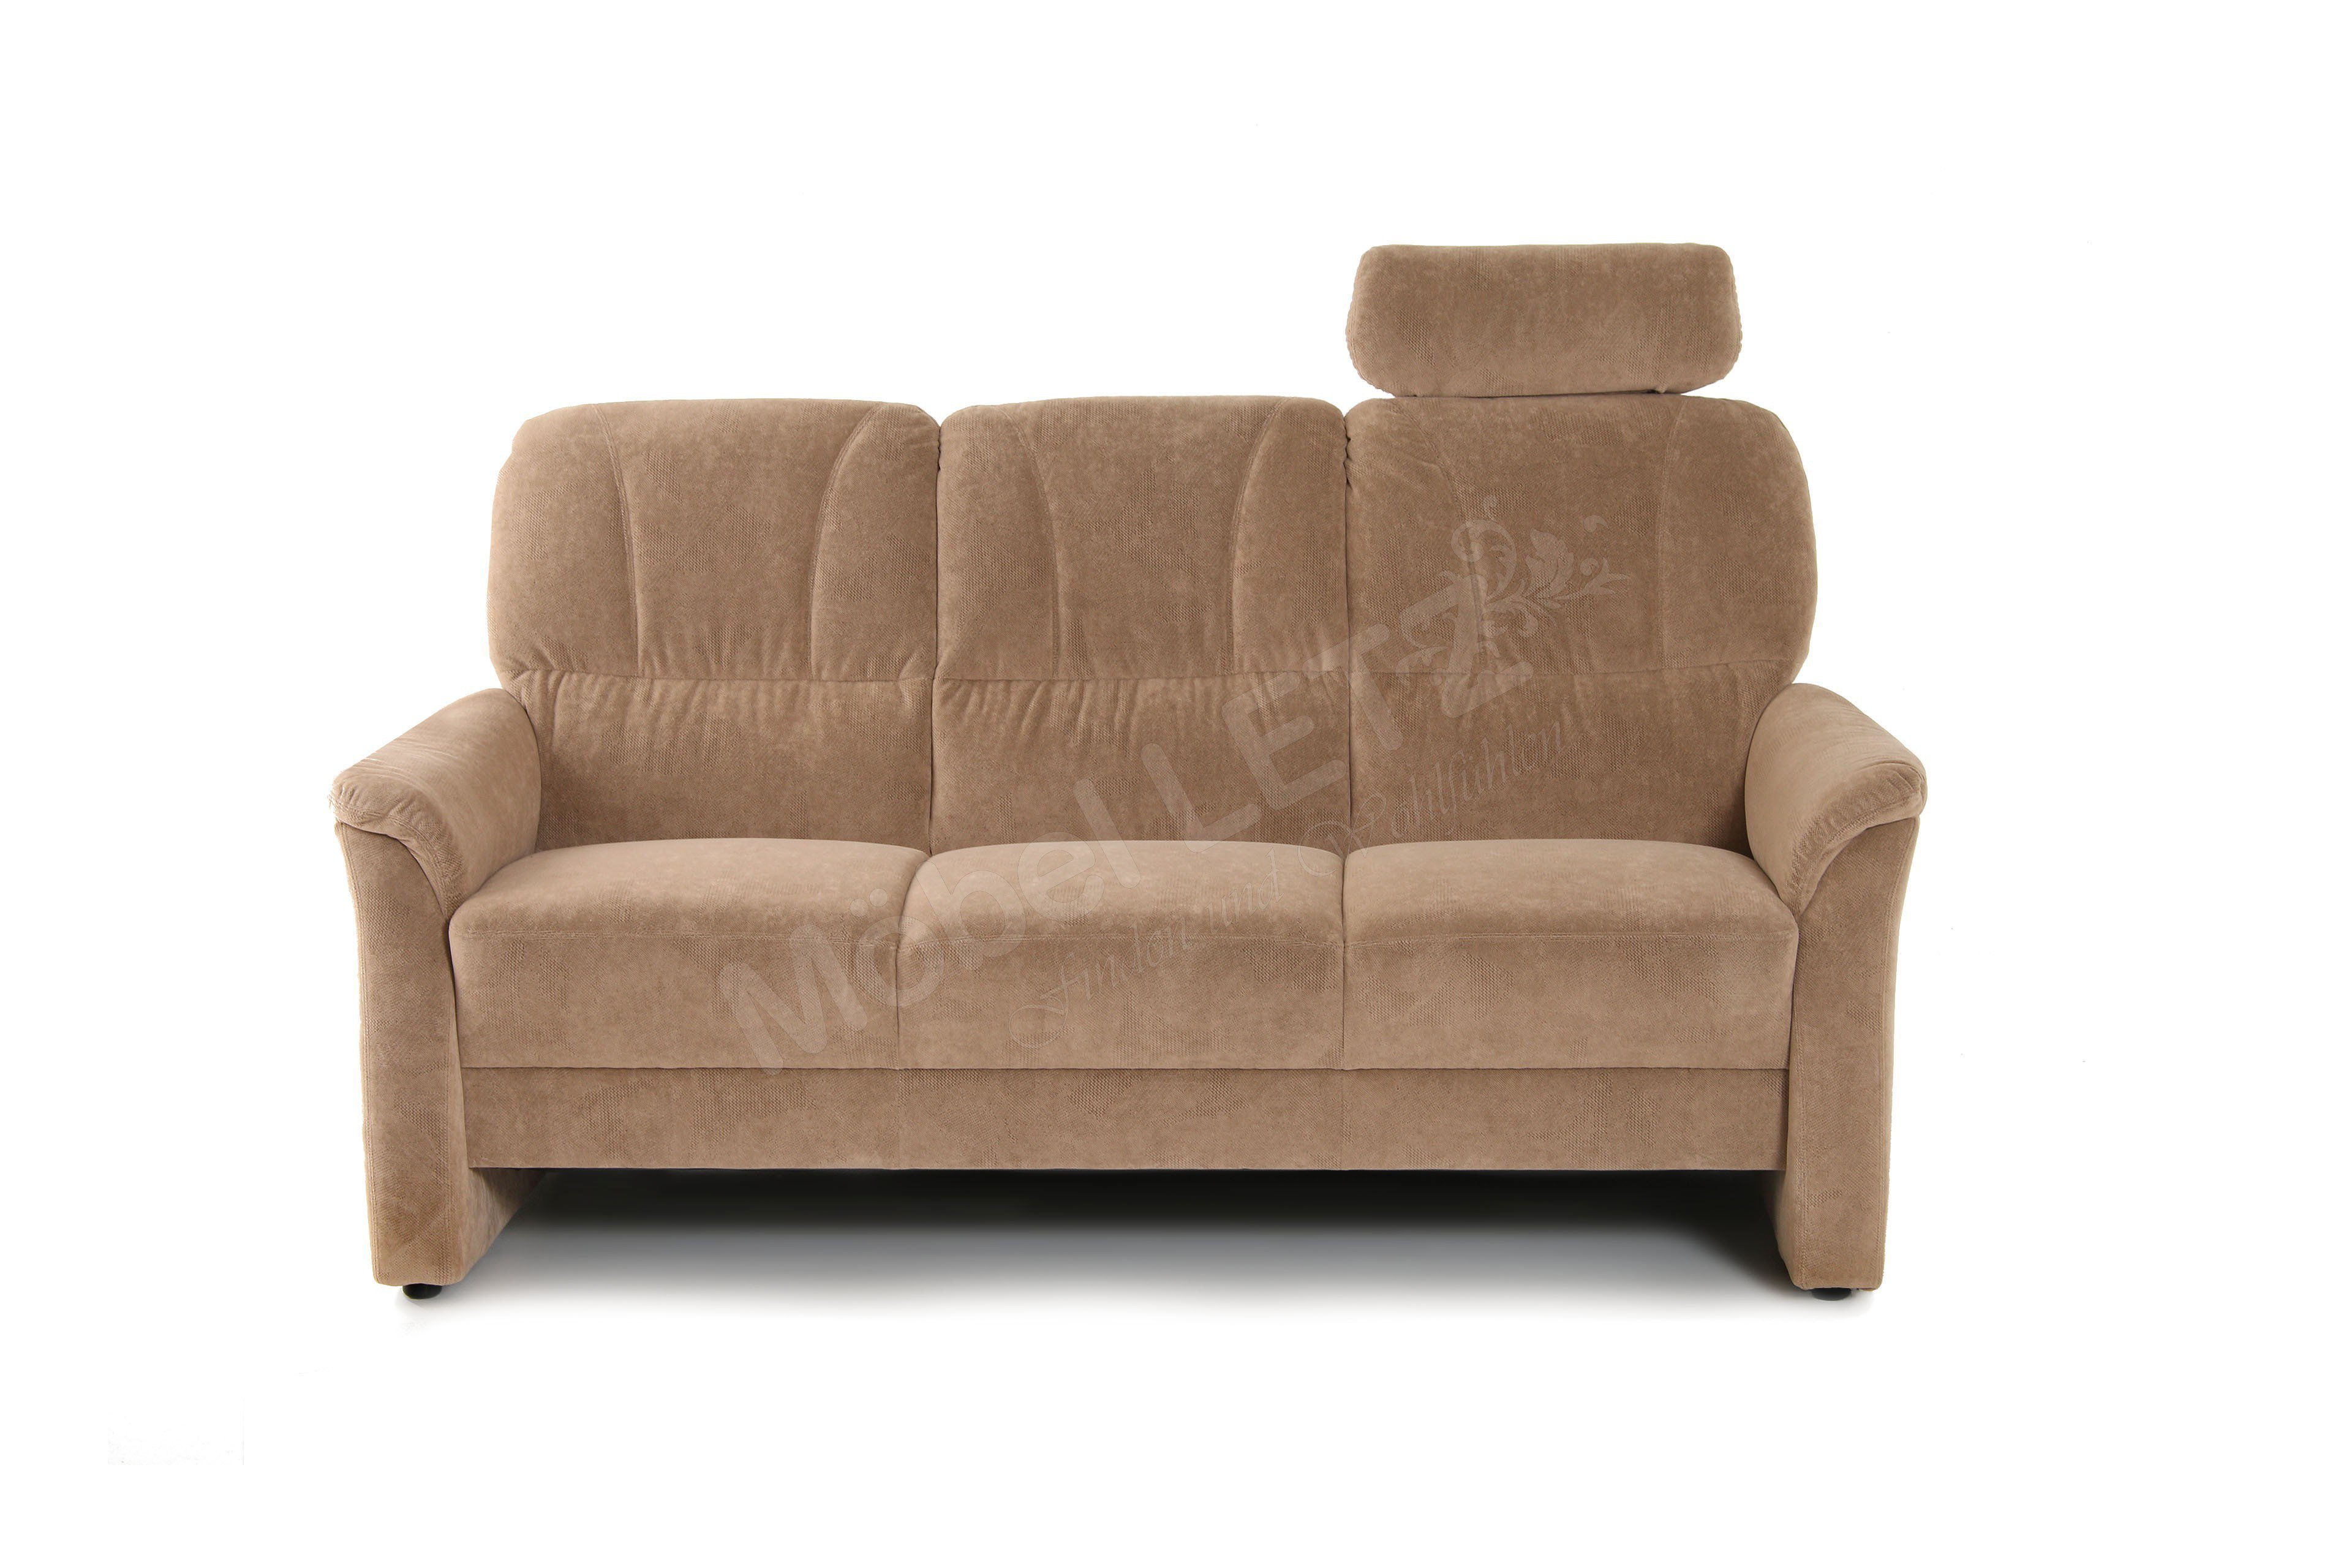 arco aalen 1000 polstergarnitur in beige m bel letz ihr online shop. Black Bedroom Furniture Sets. Home Design Ideas